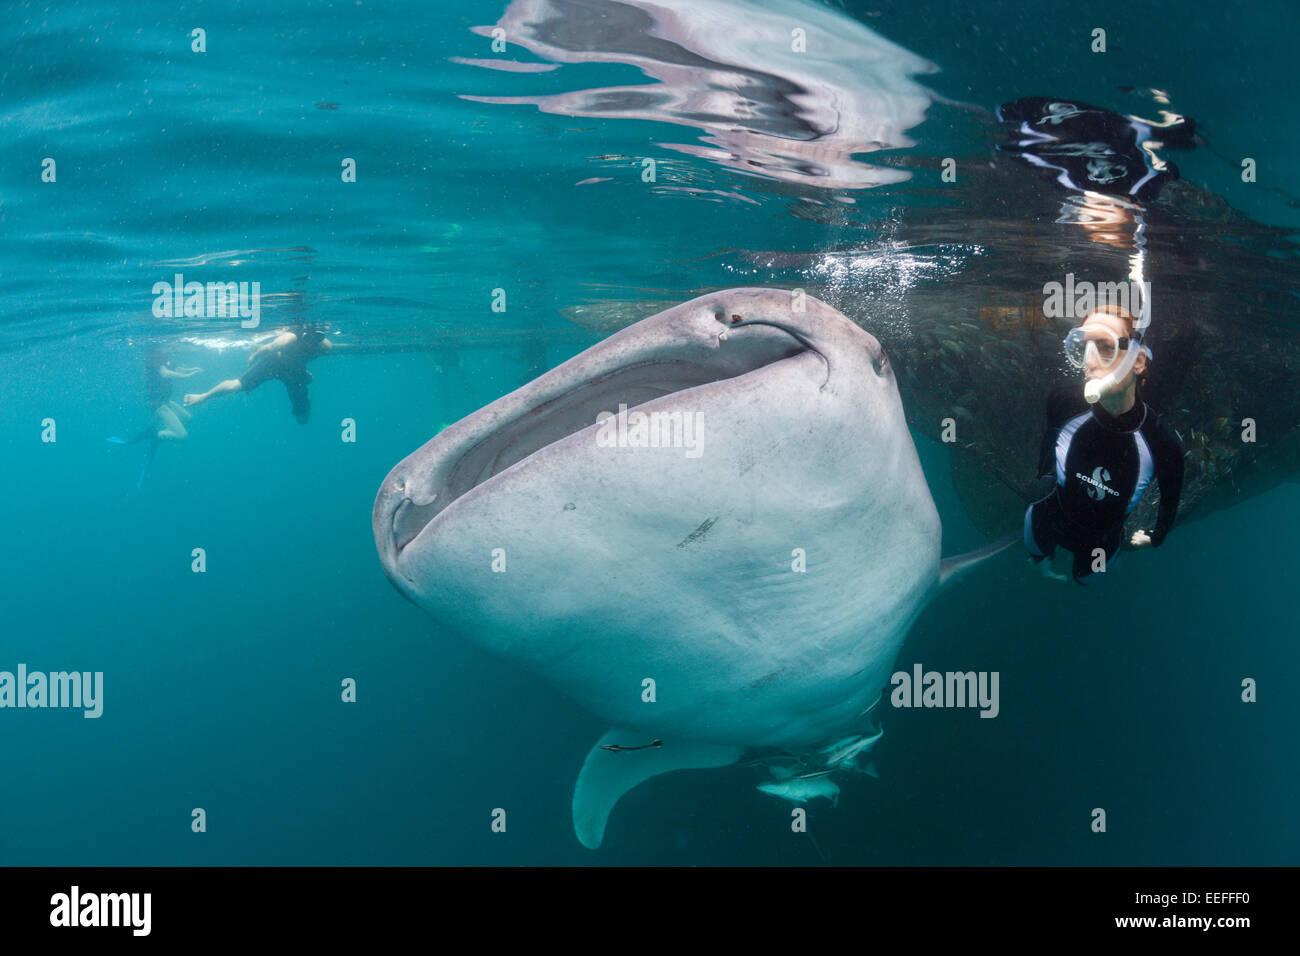 Snorkeling near Whale Shark, Rhincodon typus, Triton Bay, West Papua, Indonesia - Stock Image